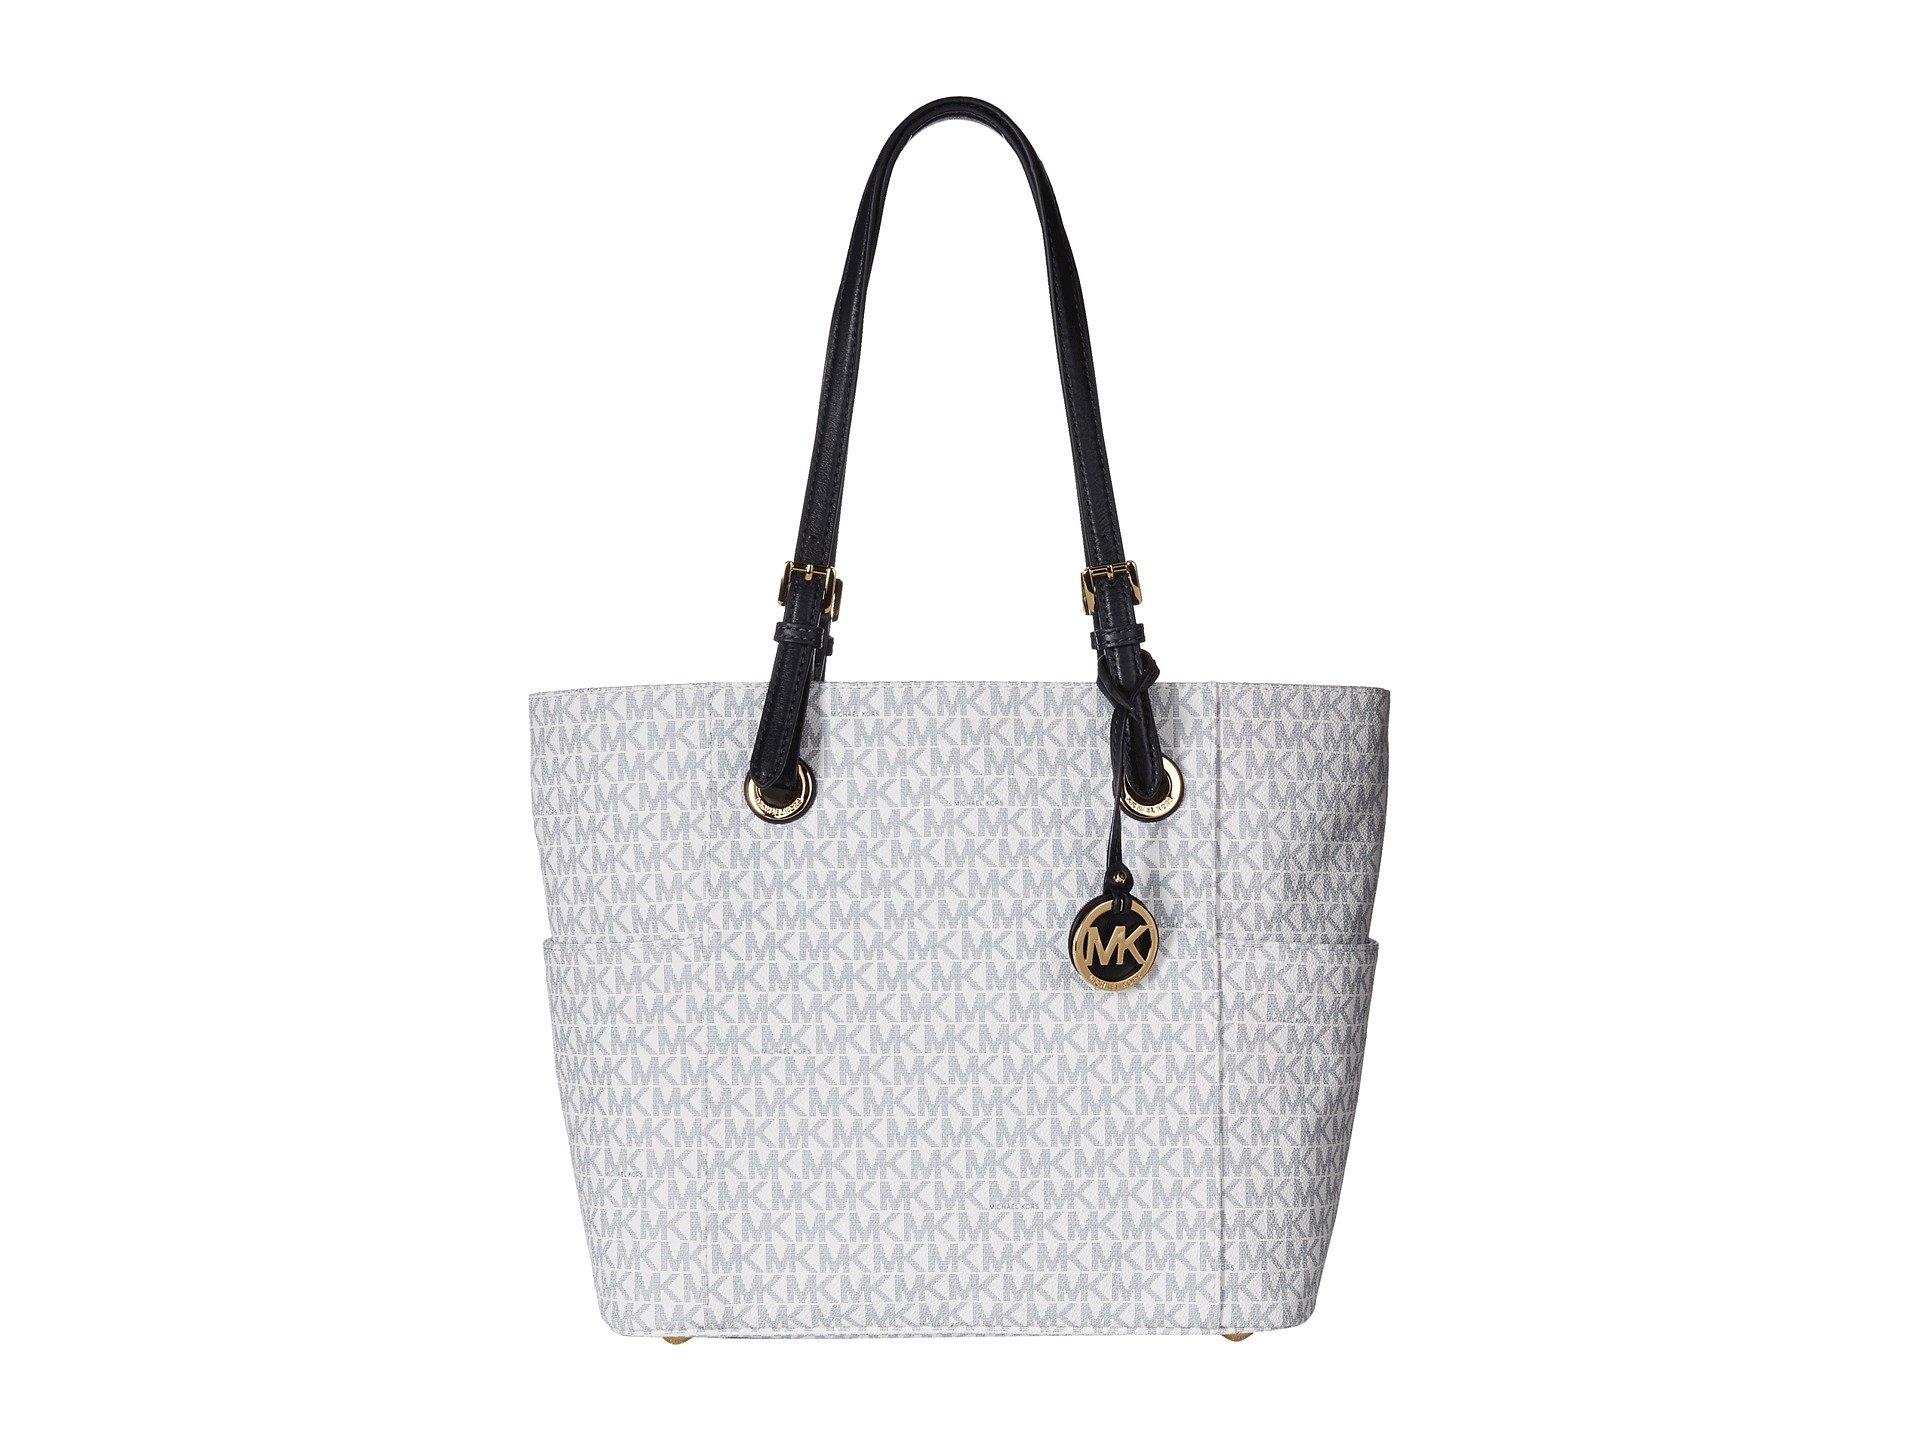 Michael Kors Women's Jet Set Travel Small Logo Tote Bag (Optic White/Navy)